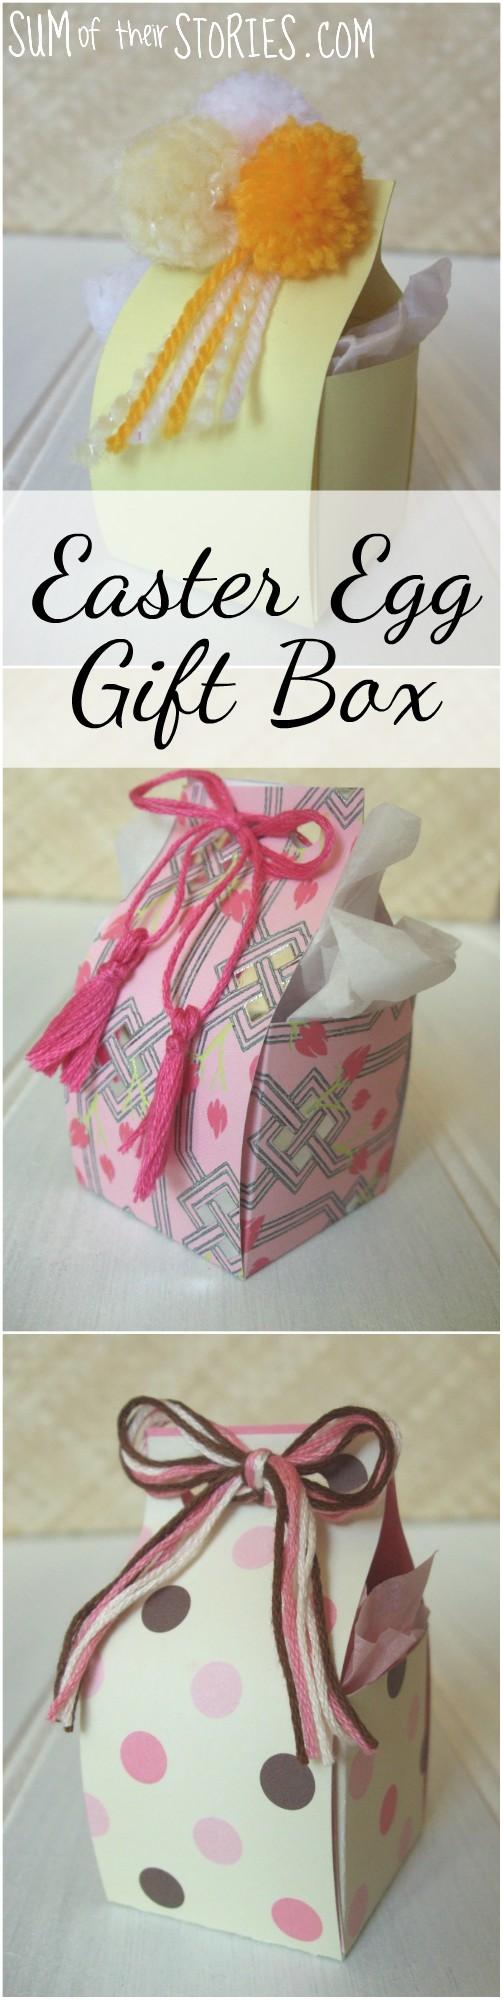 Creme Egg sizes Easter Egg Gift Boxes